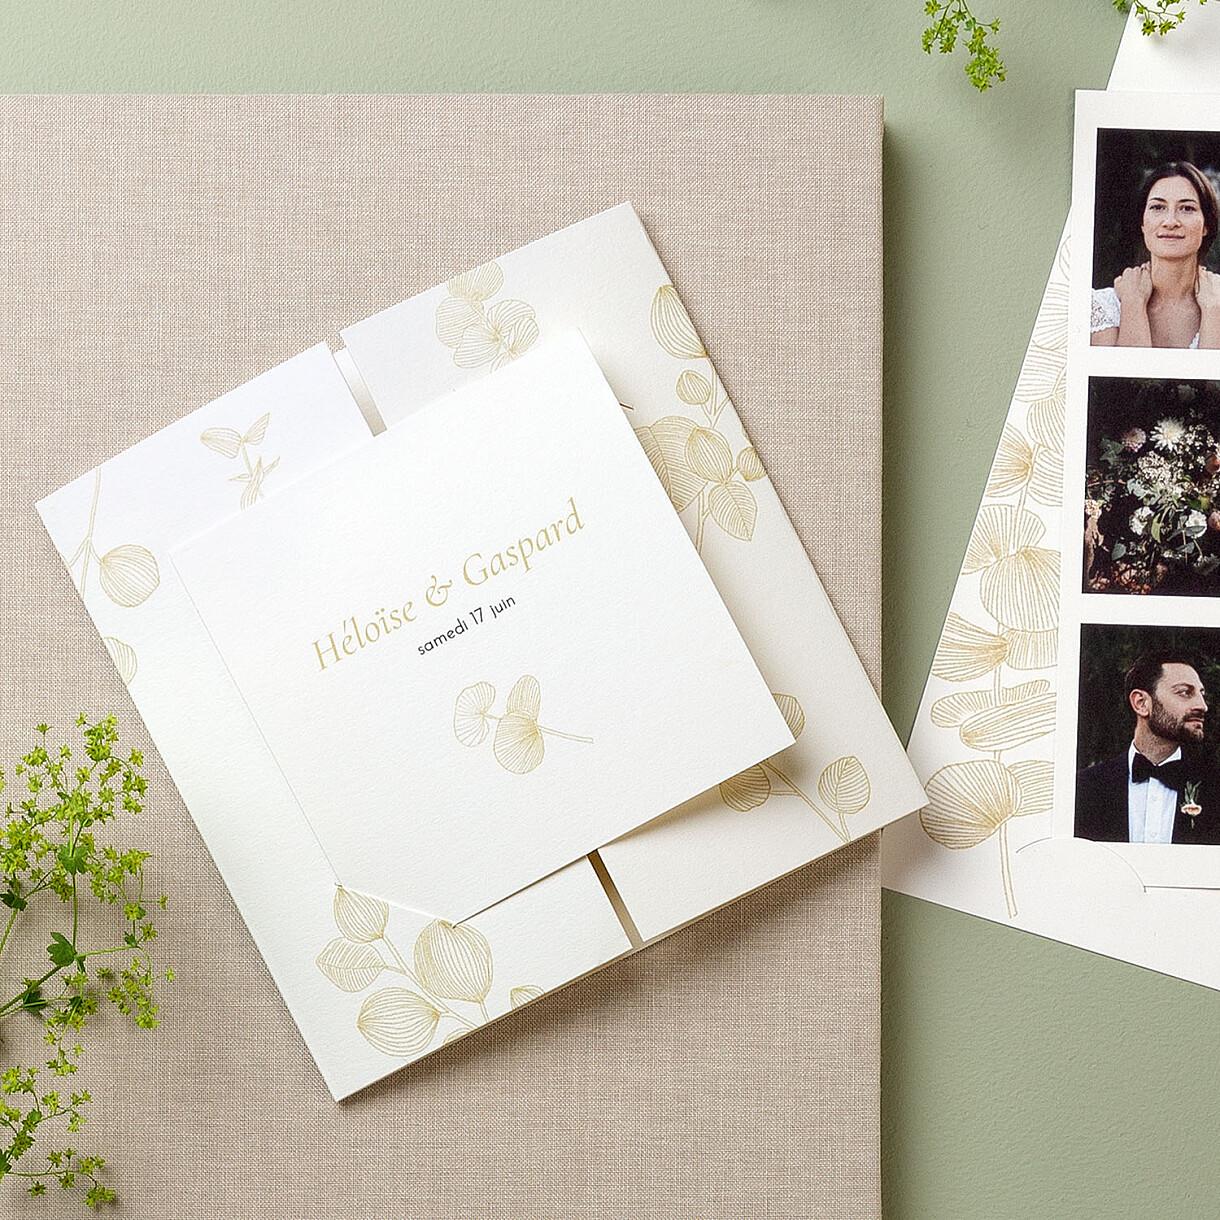 Faire-part de mariage envolée d'eucalyptus